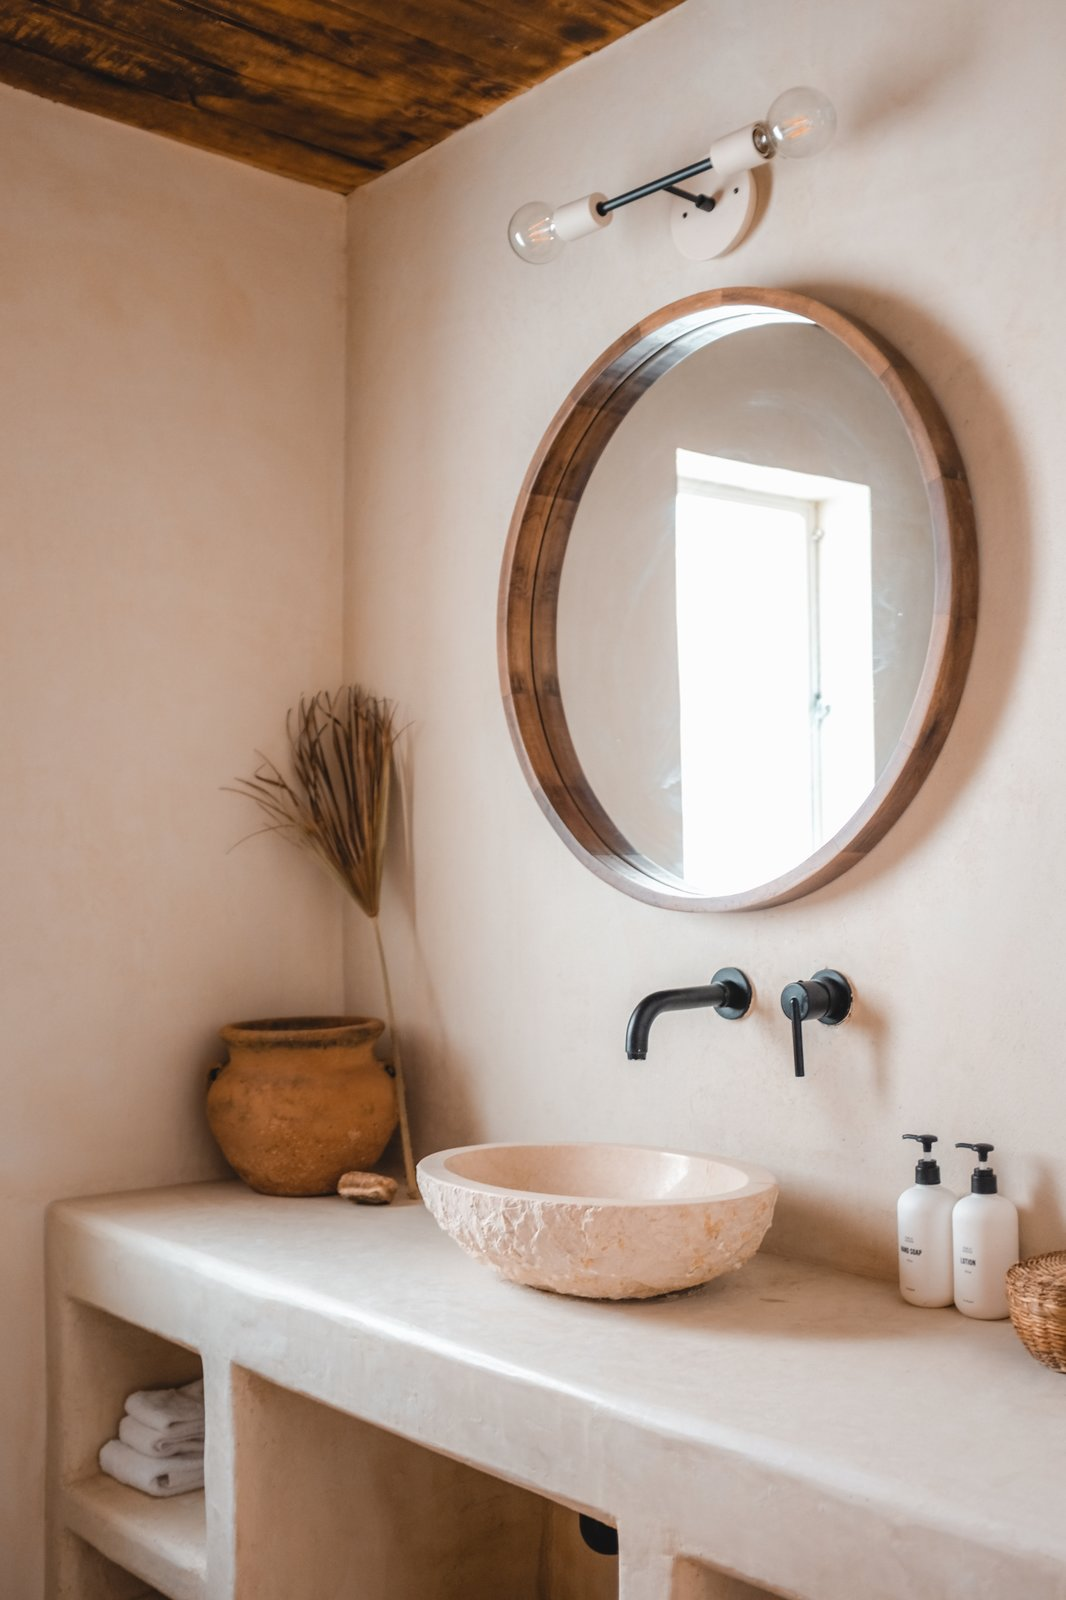 The Posada Sara and Rich Combs bathroom